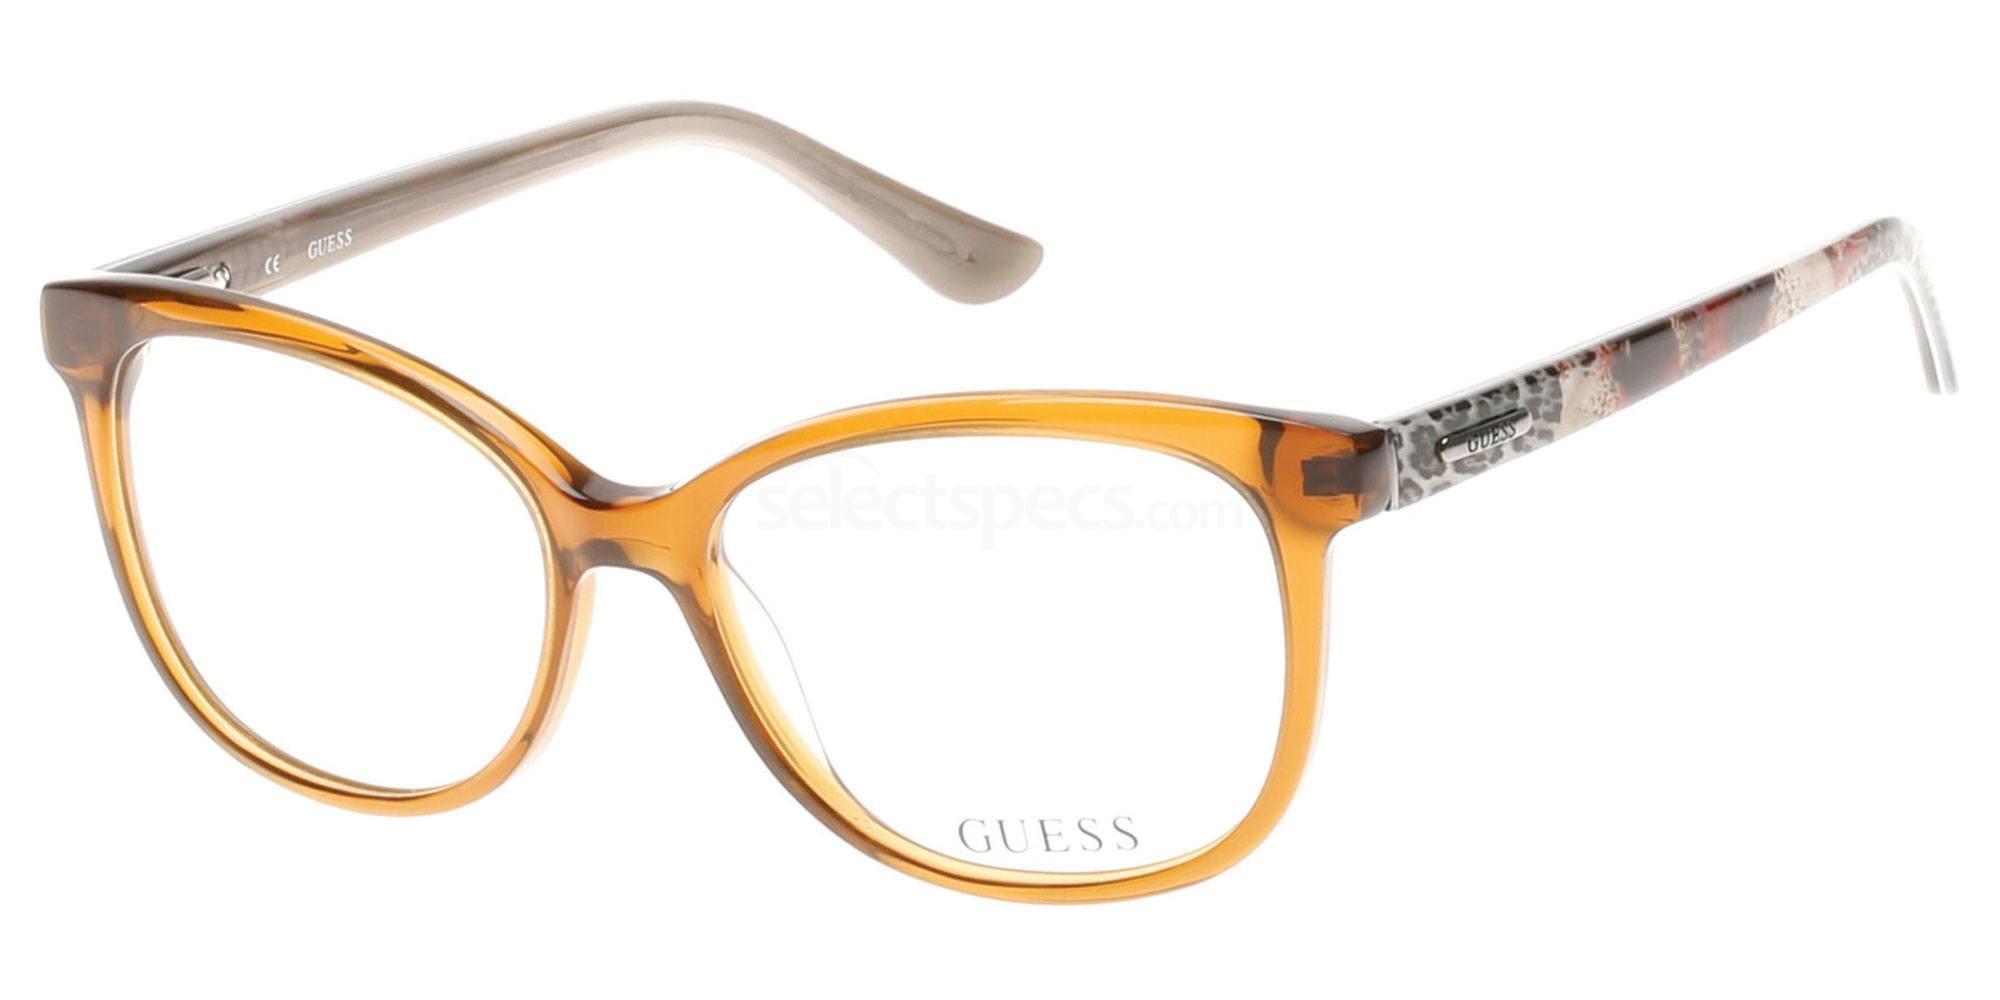 045 GU2505 Glasses, Guess